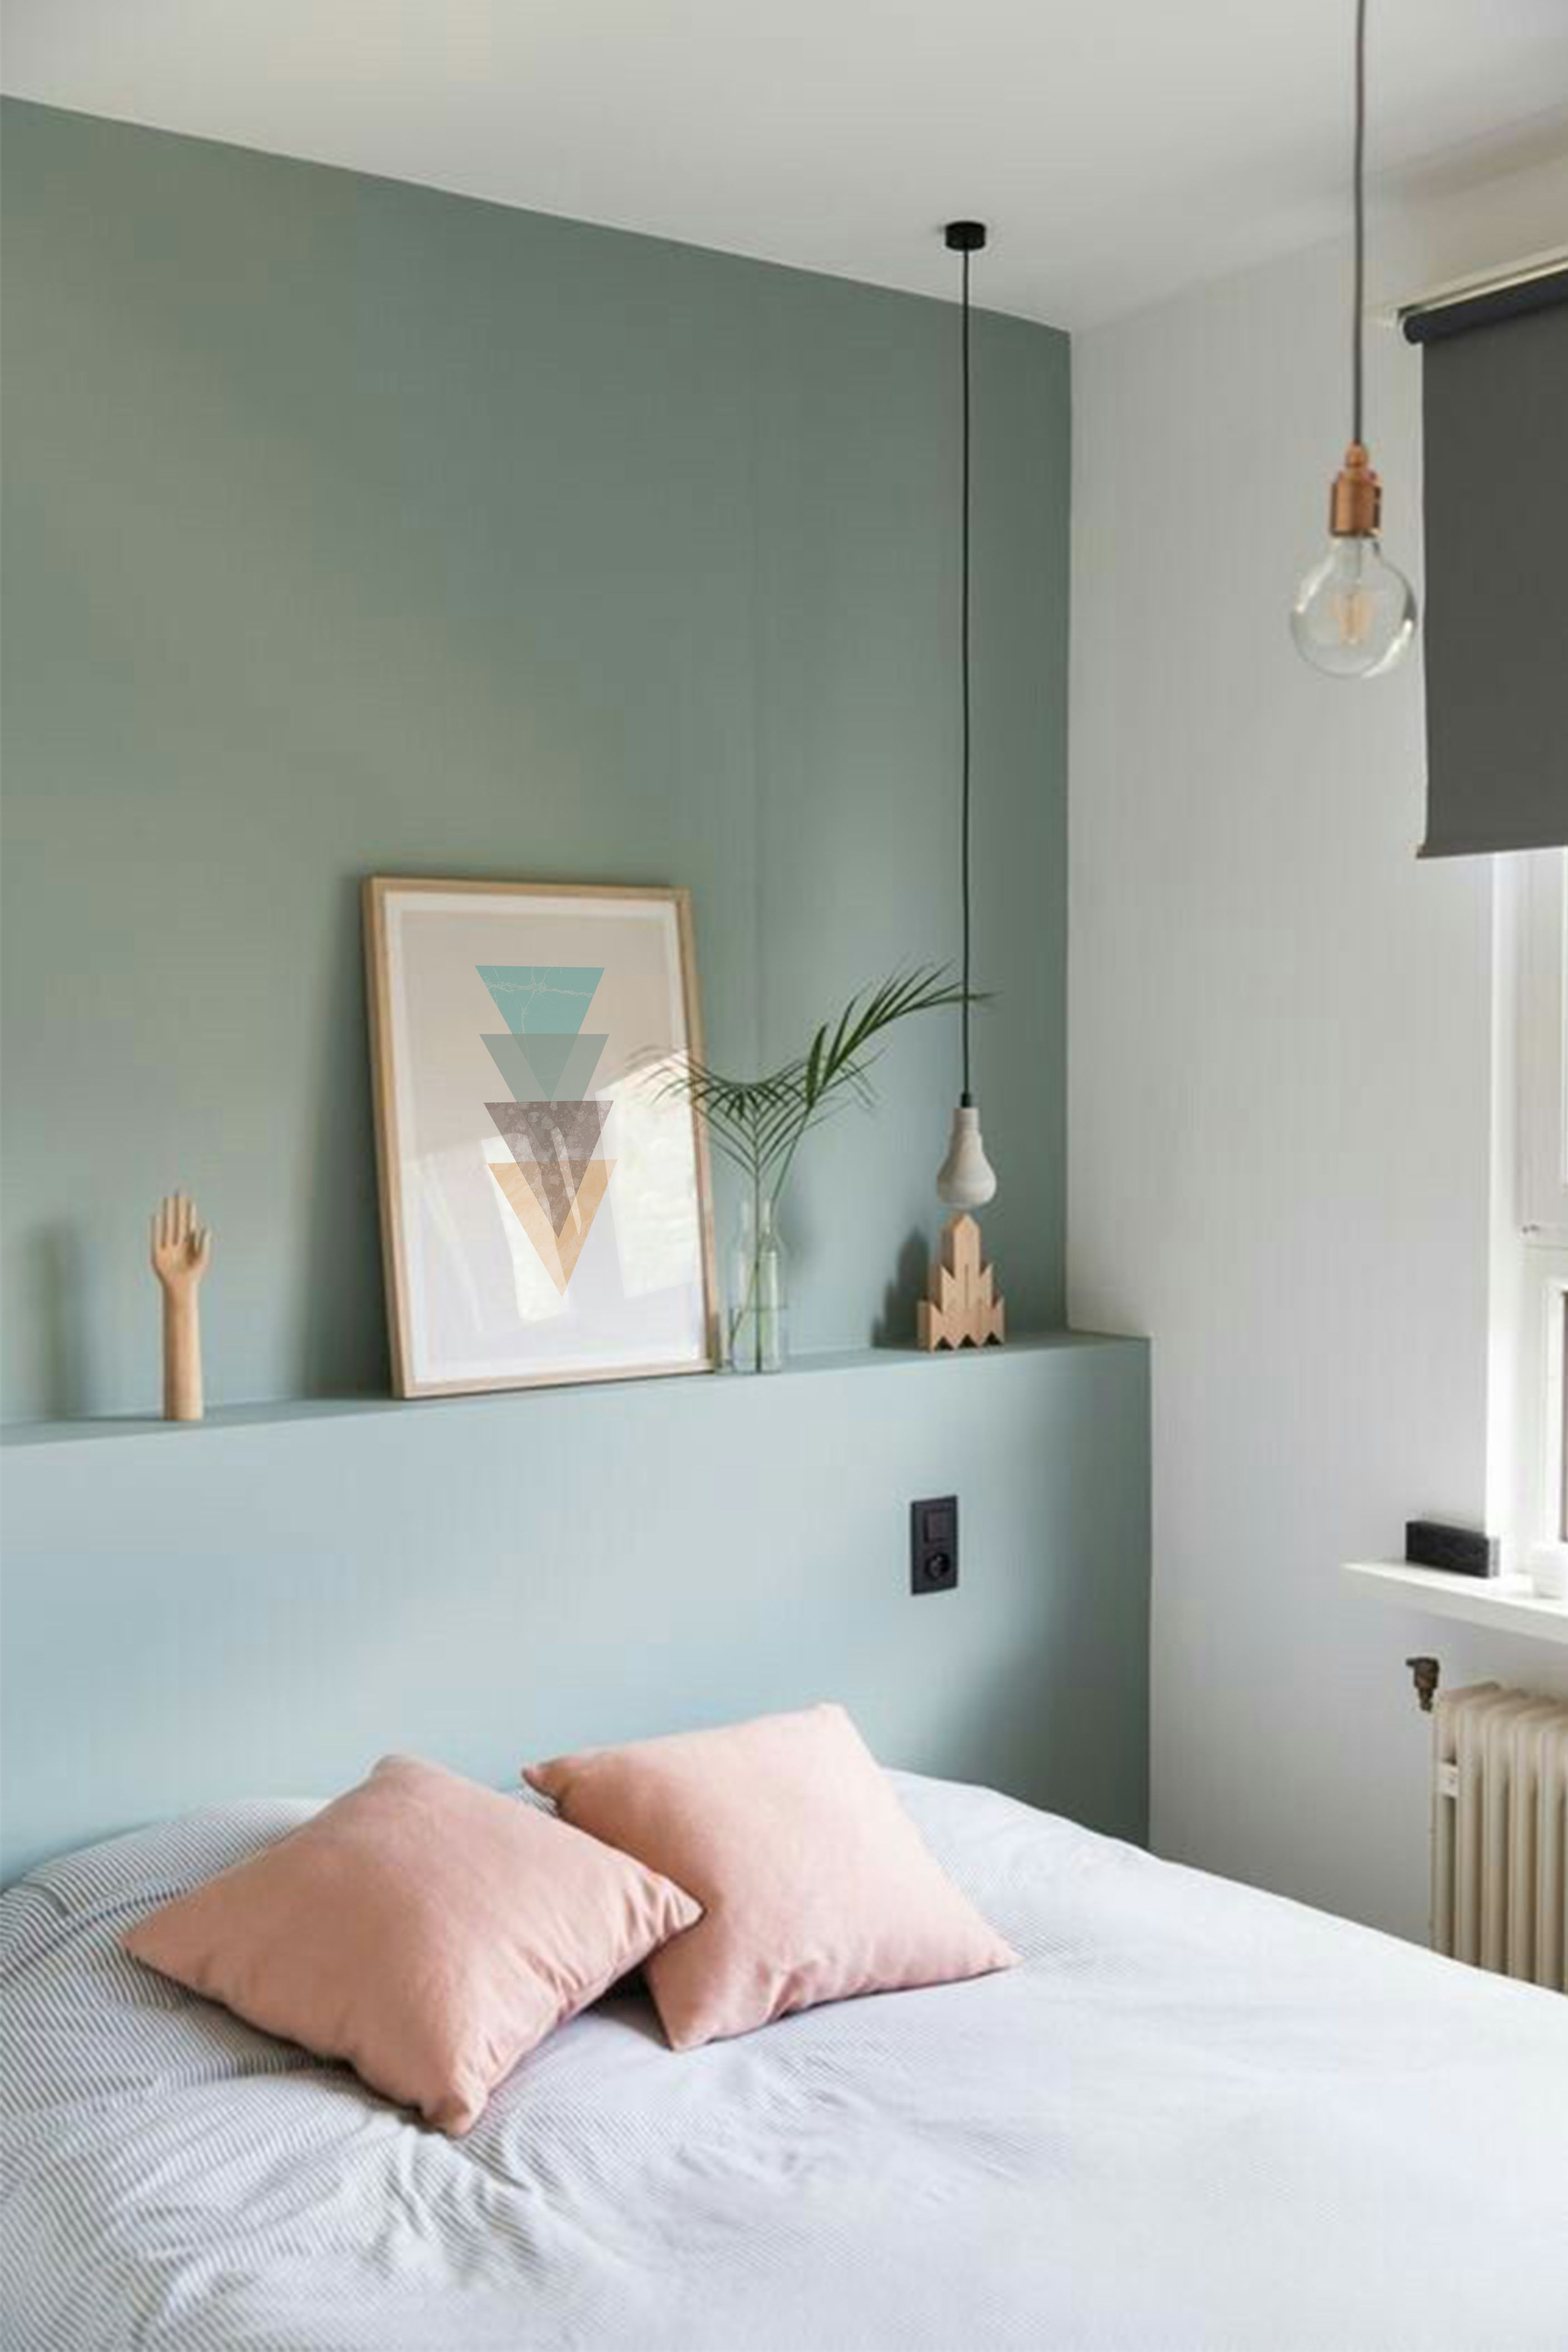 Turquoise Printable Home Decor Geometric Print Minimalist Art Bedroom Poster Turquoise Wall Art Digital Print In 2021 Bedroom Green Home Decor Bedroom Bedroom Colors Green minimalist room decoration